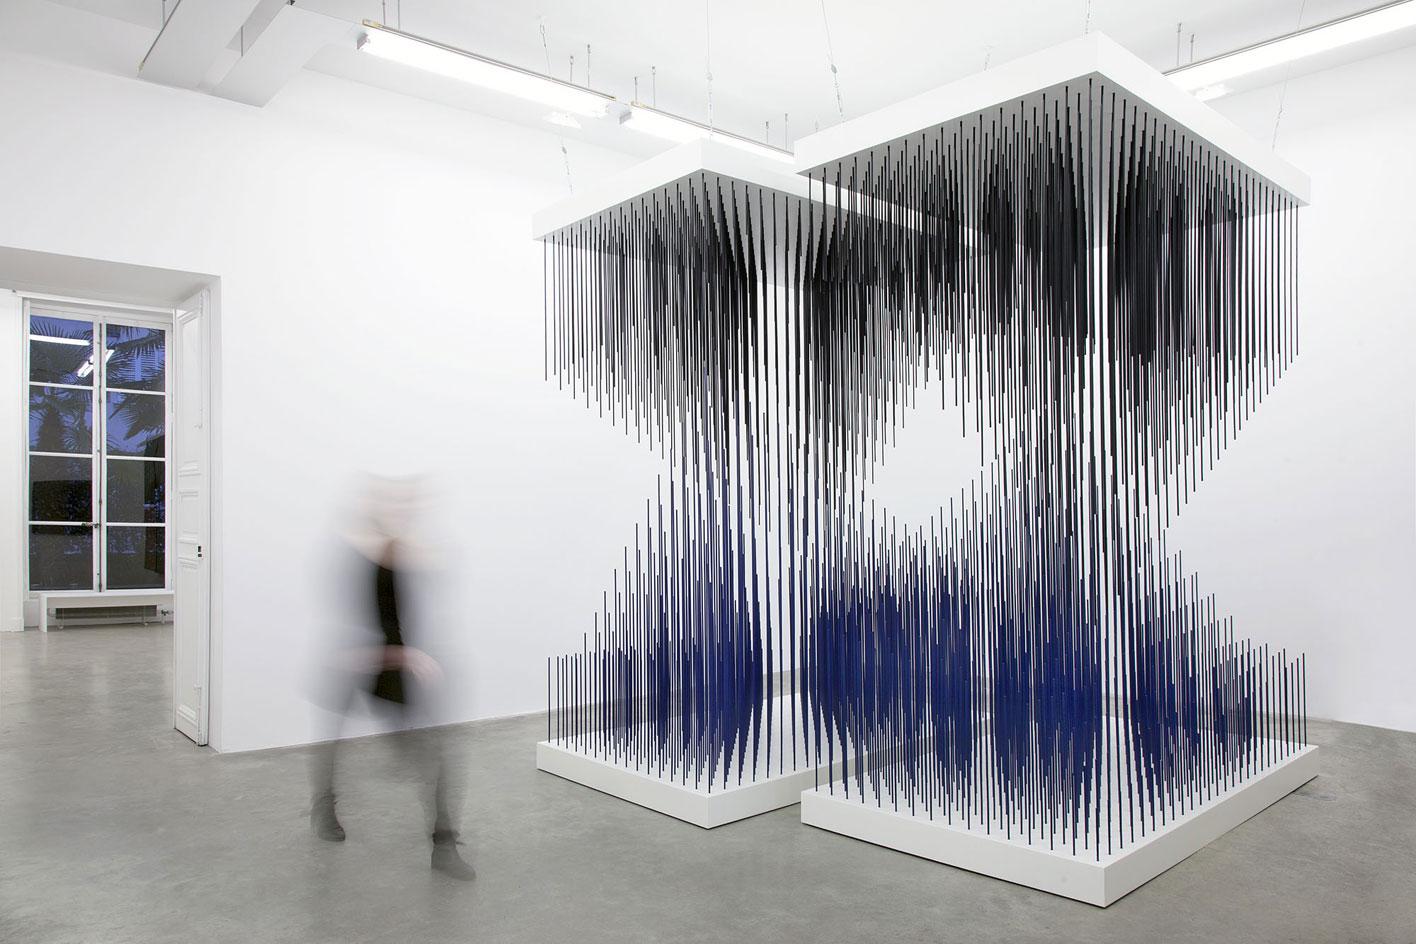 Galerie Perrotin, Jesus Rafael Soto, abstraction, installation, modernisme, art cinétique, chronochrome